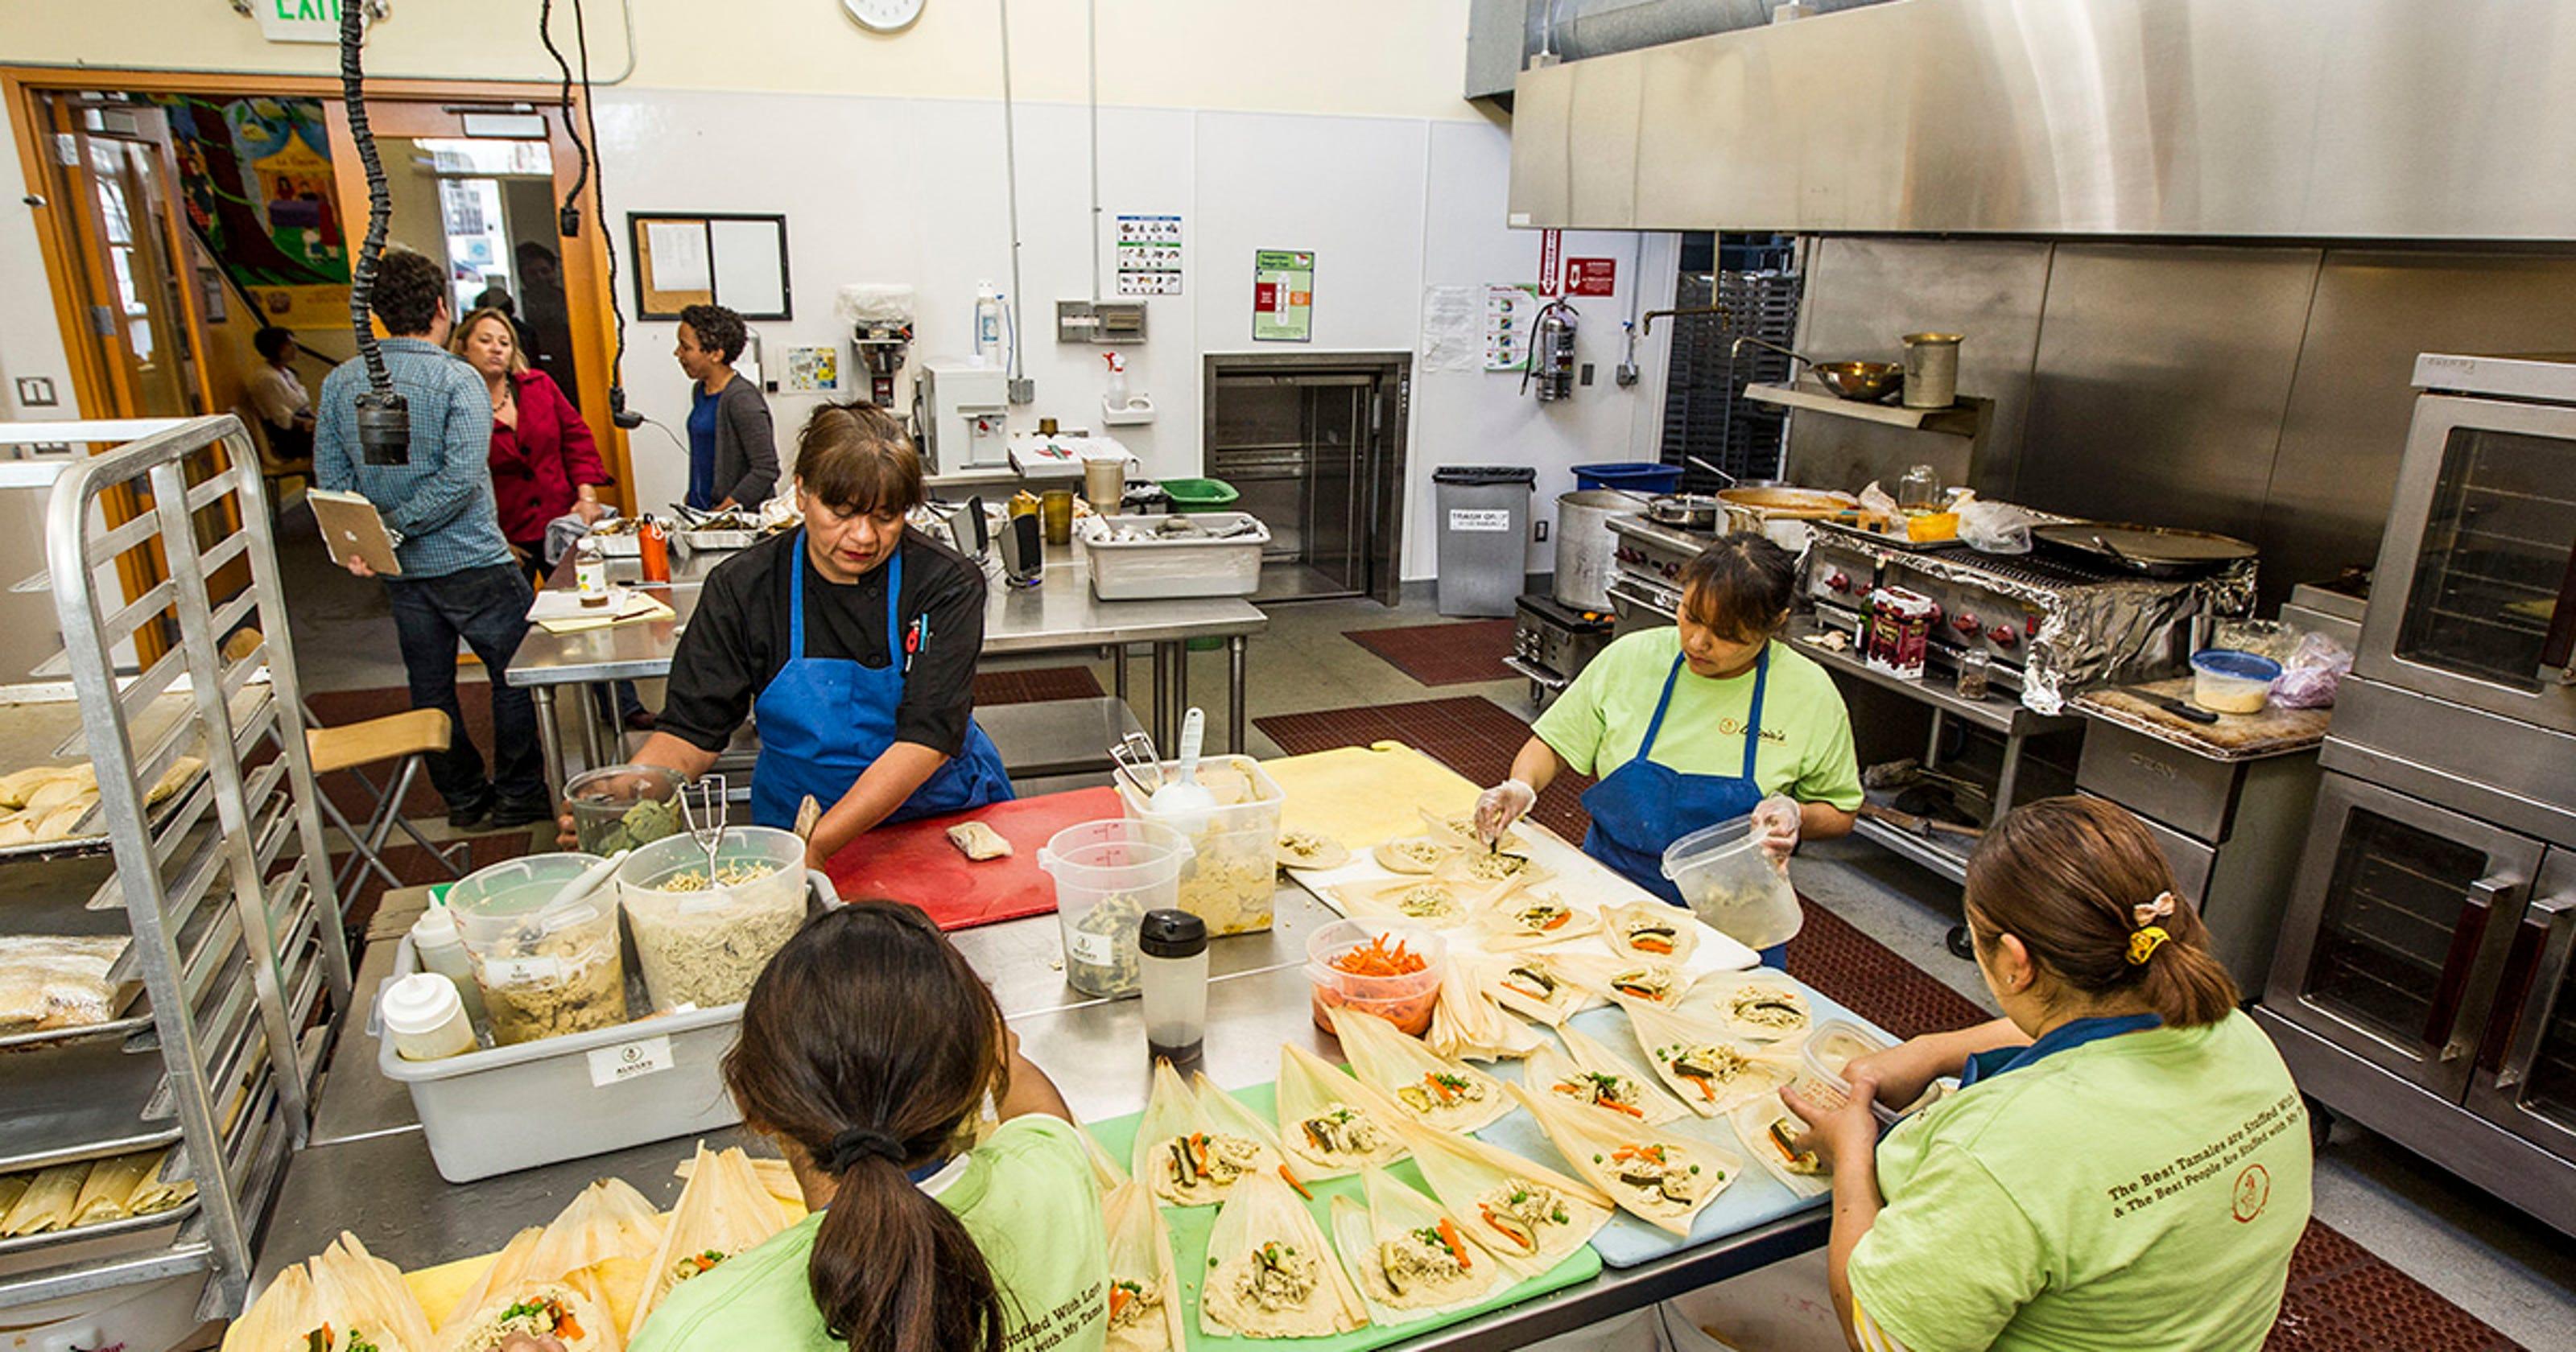 aspiring restaurateurs relying on kitchen incubators - Kitchen Incubator